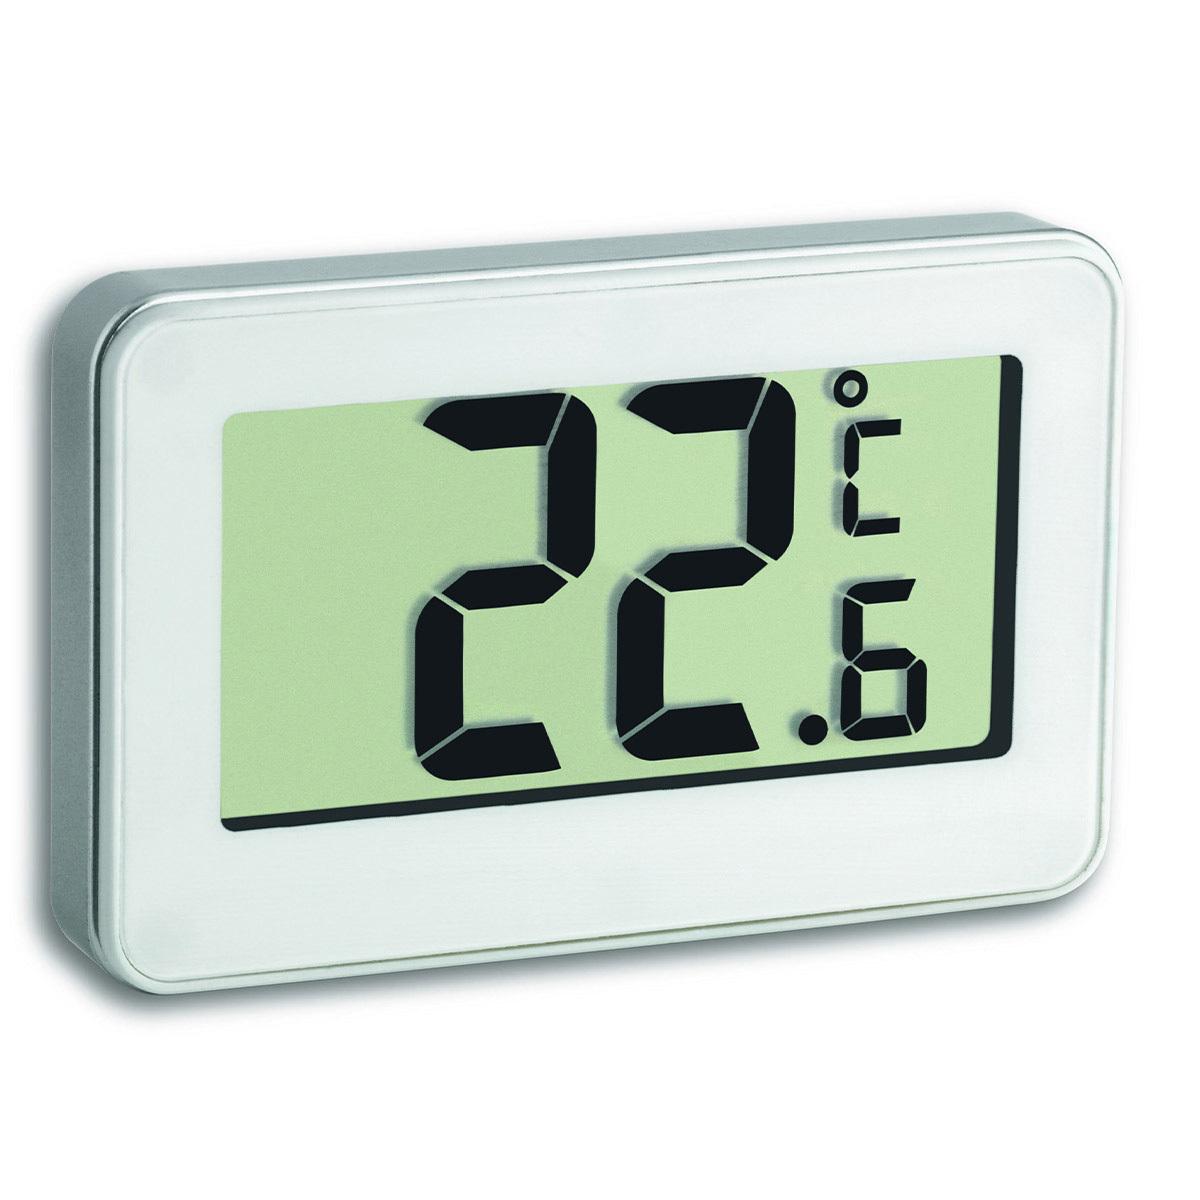 30-2028-02-digitales-thermometer-ansicht1-1200x1200px.jpg